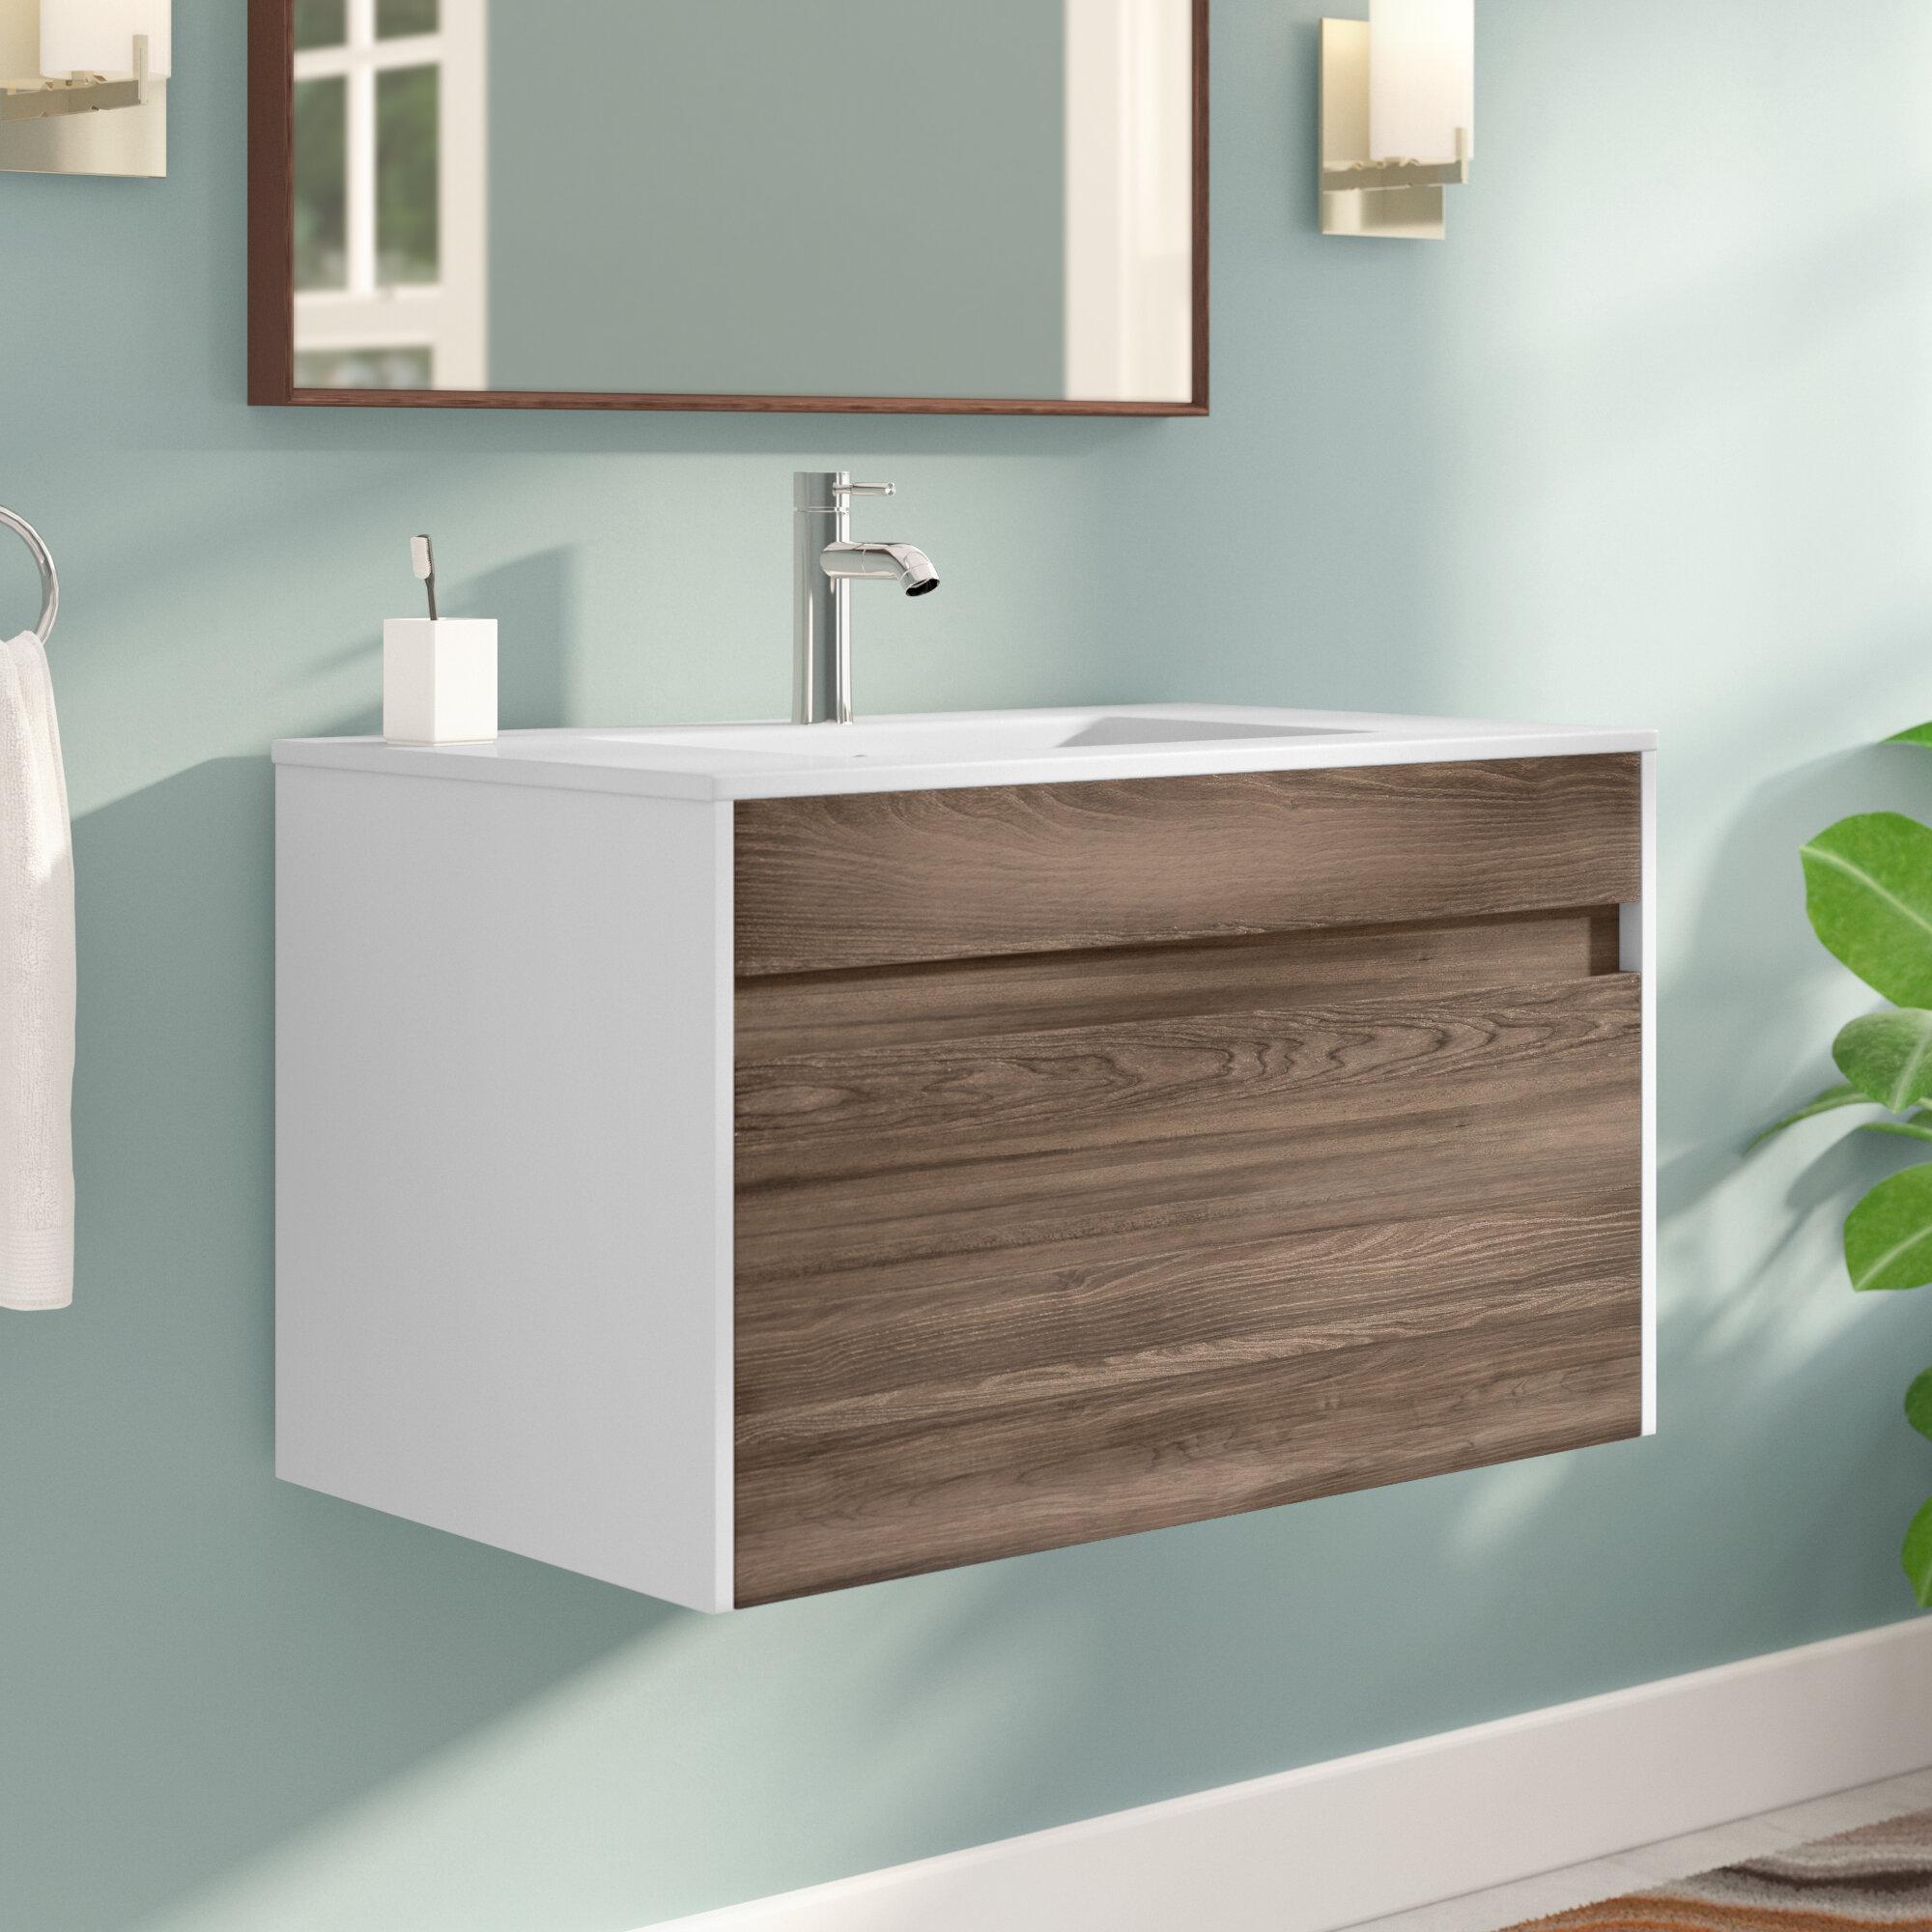 Ivy Bronx Frida 30 Single Bathroom Vanity Reviews Wayfair